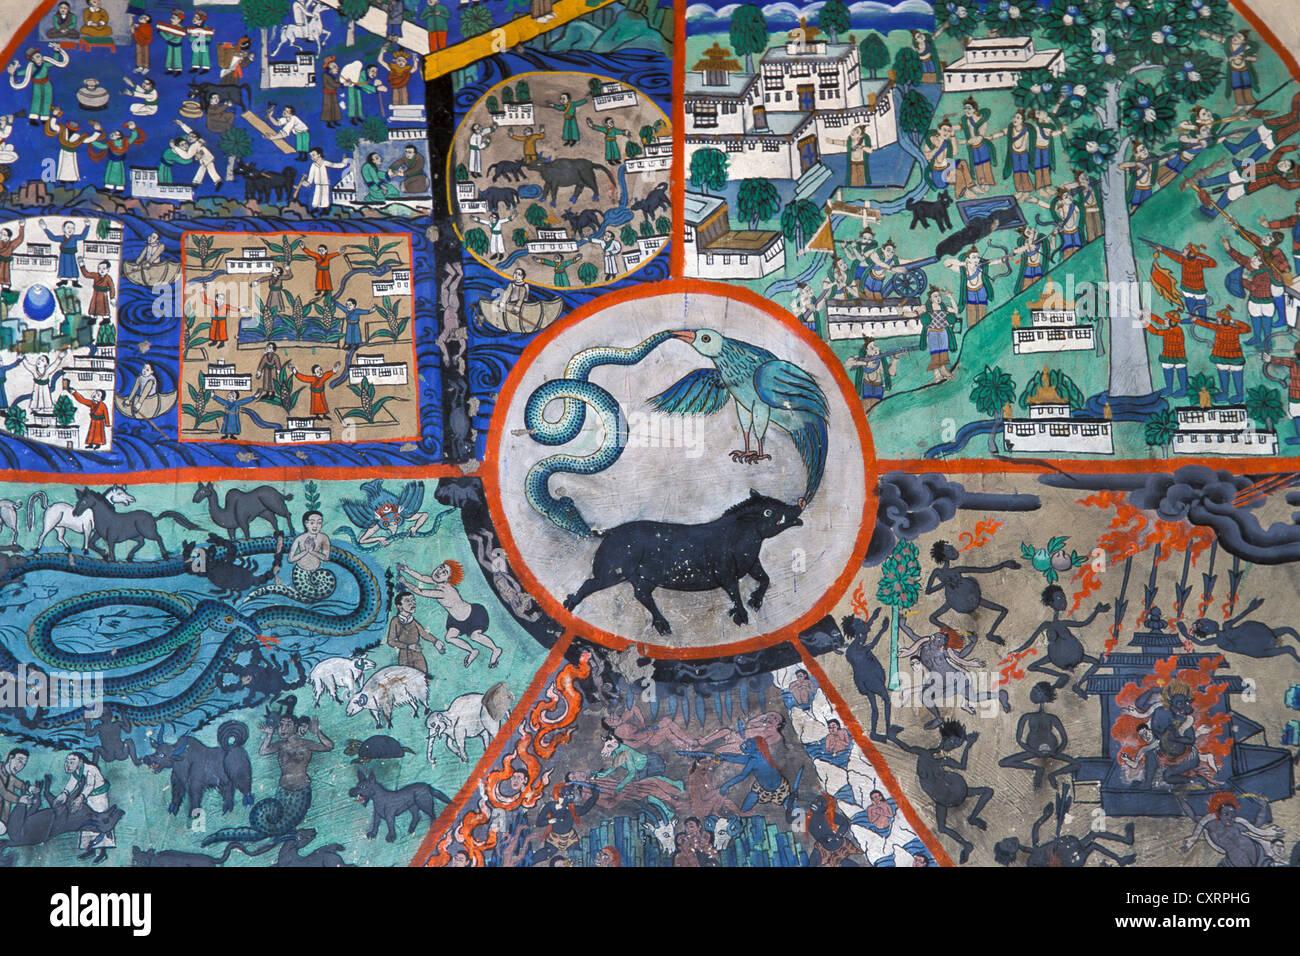 Buddhist Mural Tibetan Buddhism Yama God Of Death Holding The Stock Photo Alamy